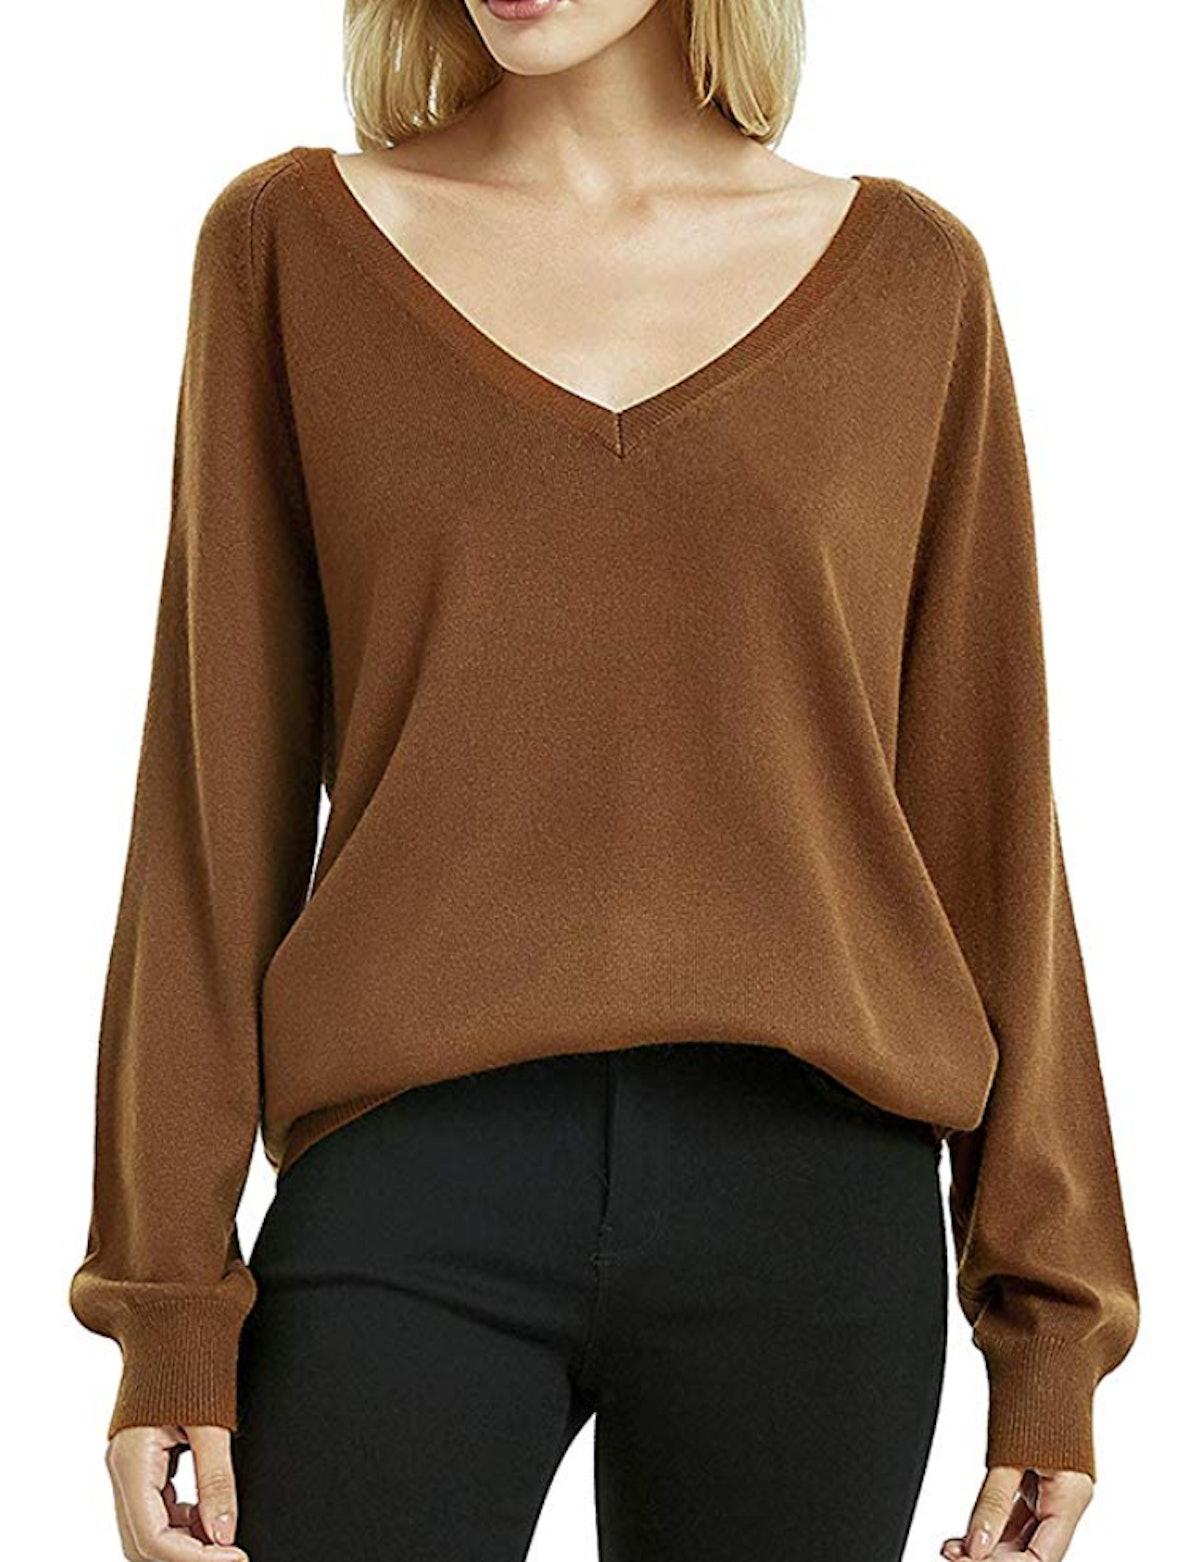 Kallspin Cashmere Wool Blended Sweater